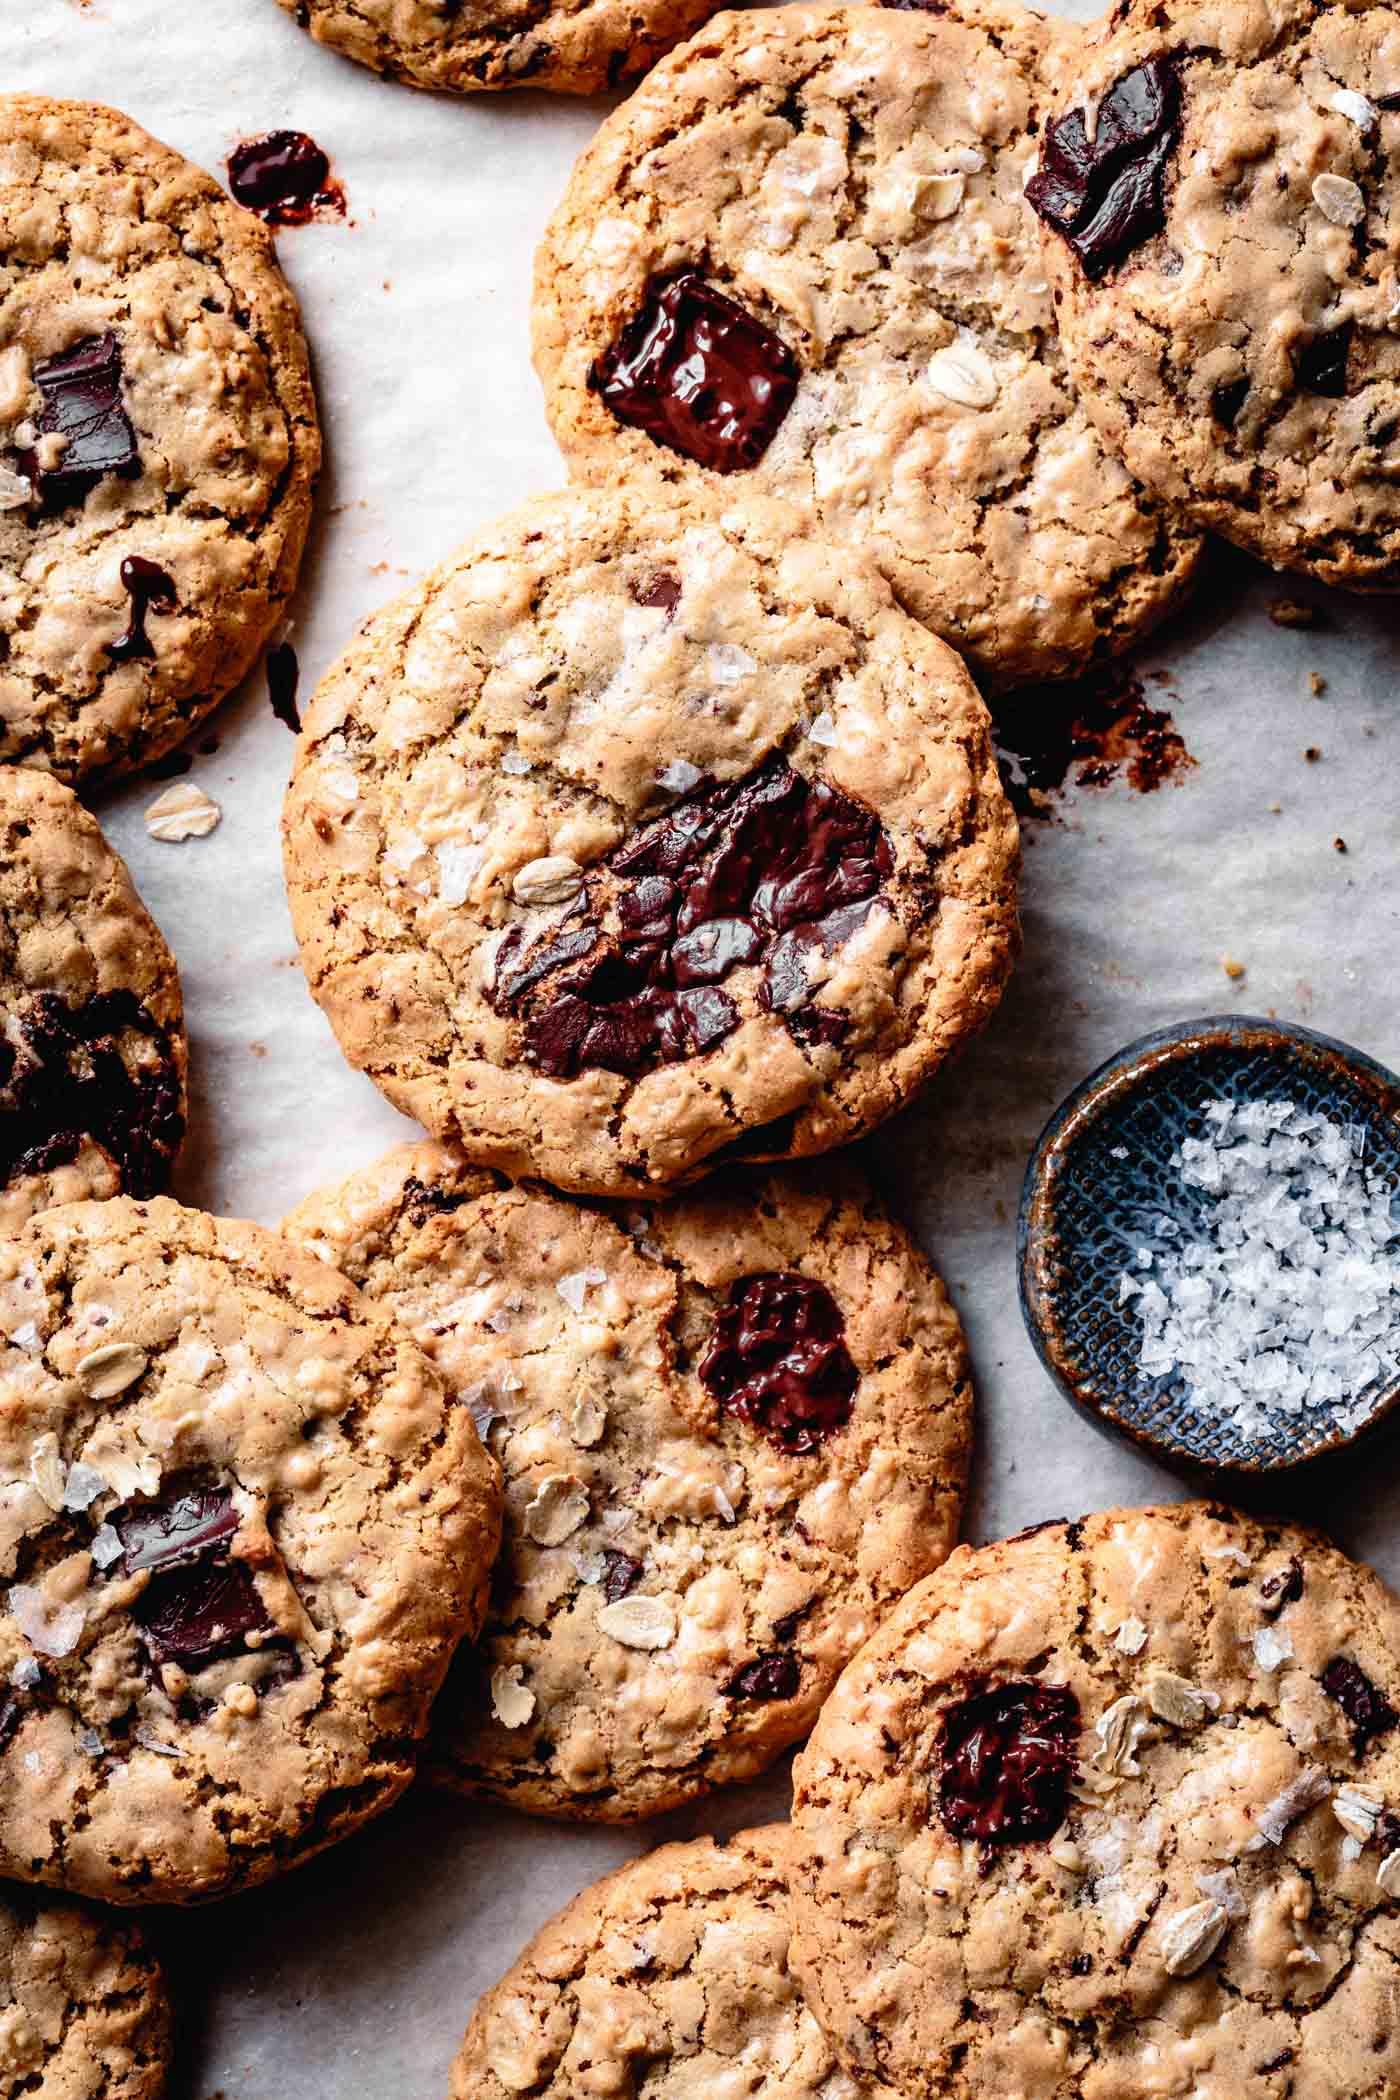 Freshly baked vegan gluten-free tahini chocolate chip cookies with flaky salt